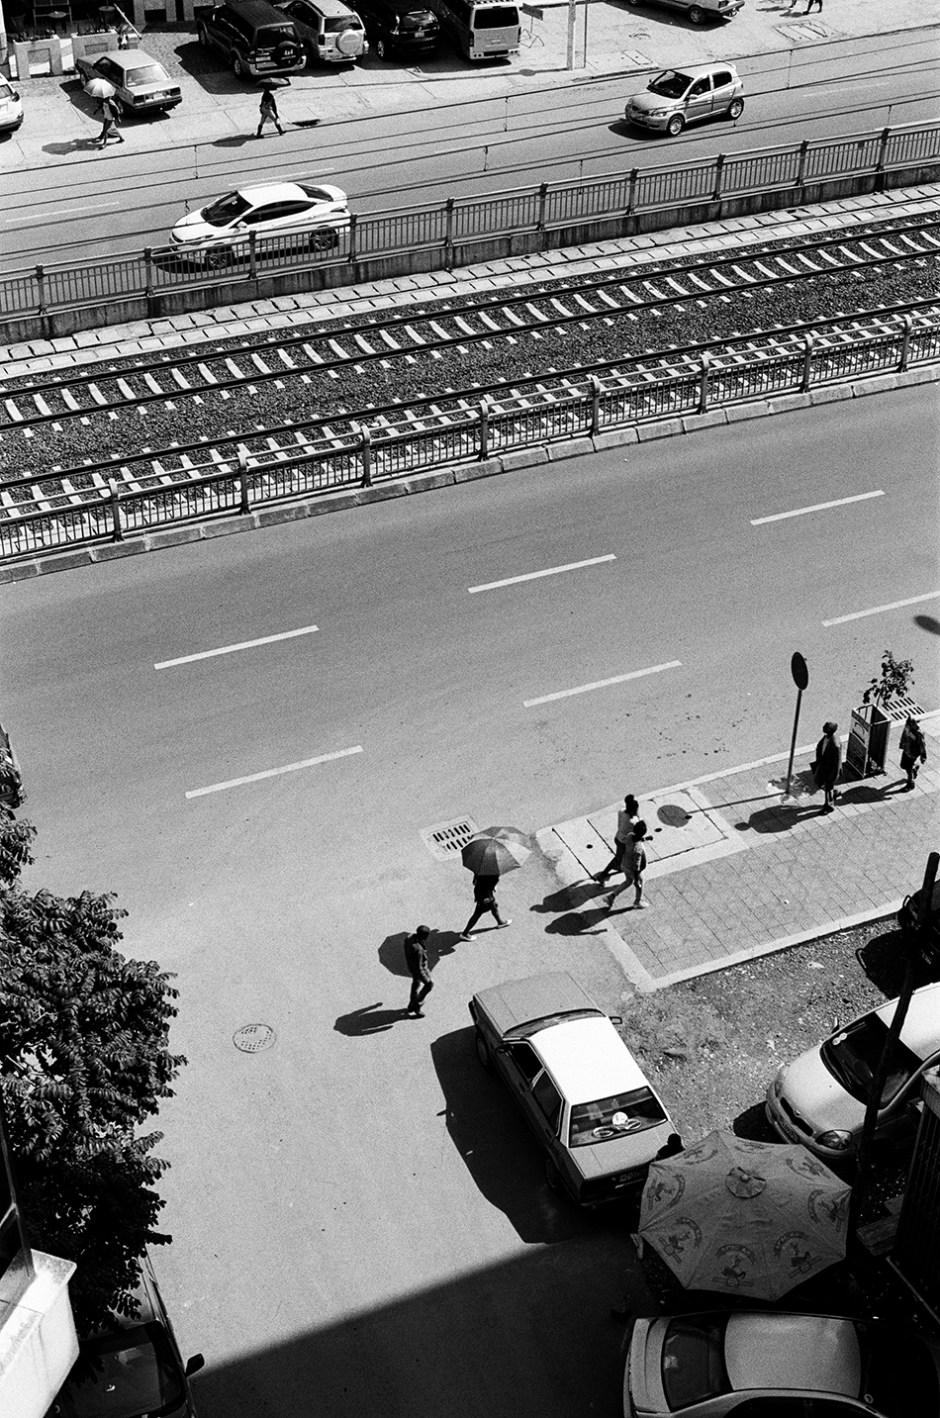 5 - People crossing street in Addis